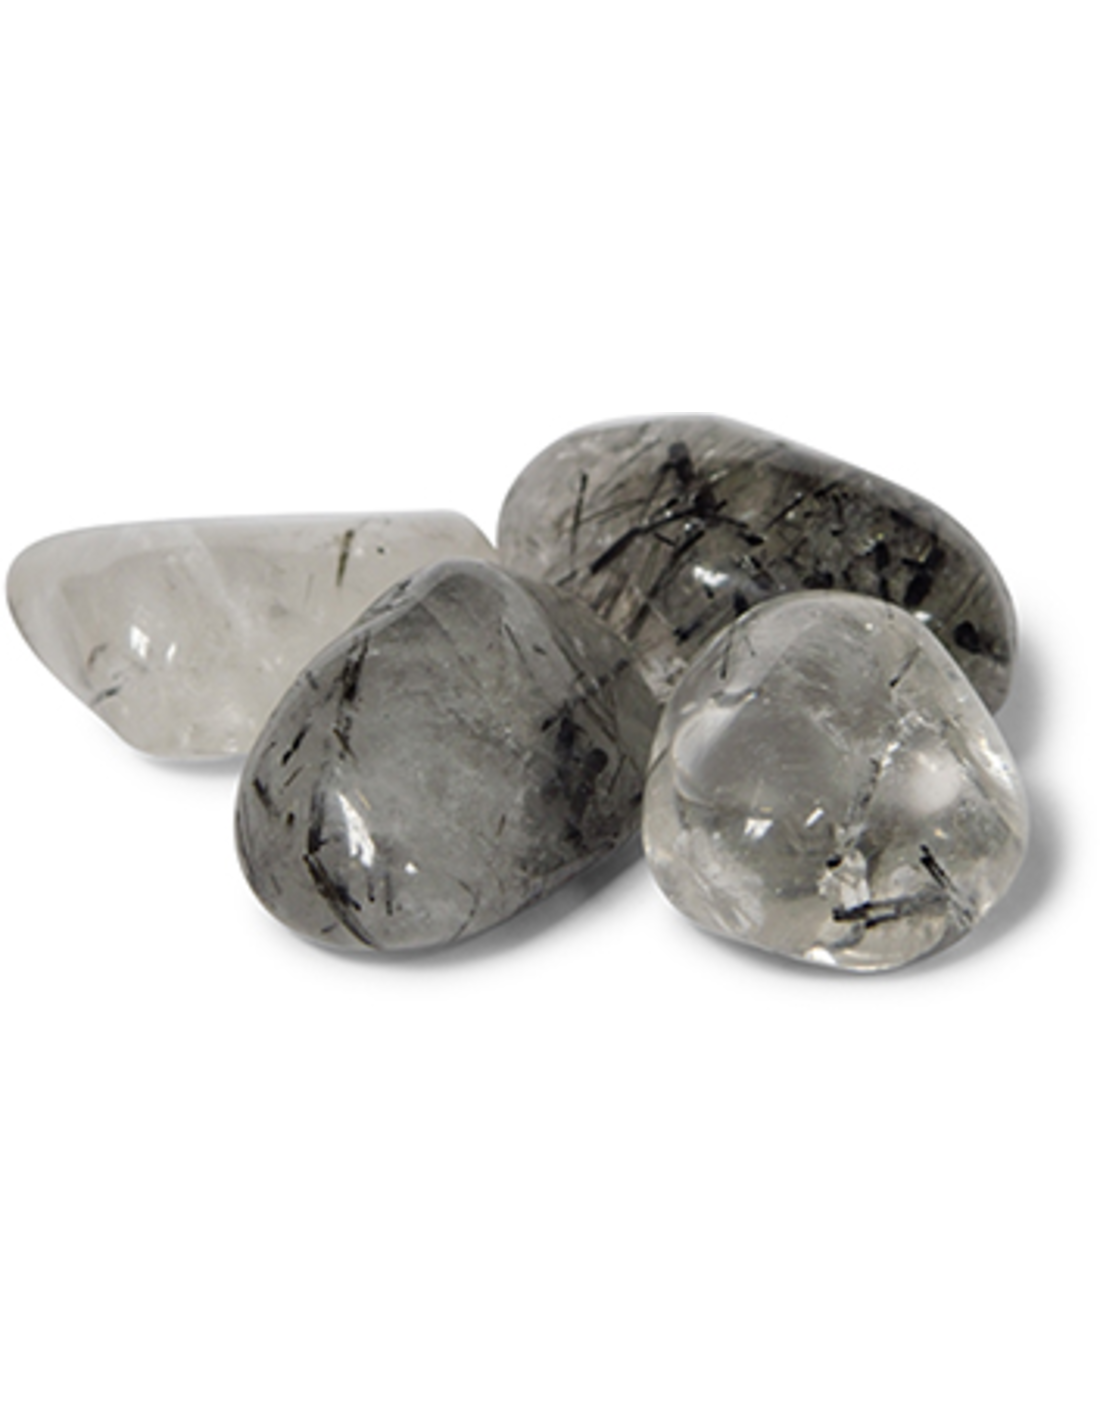 Toermalijnkwarts 3 st. trommelstenen (mt3)